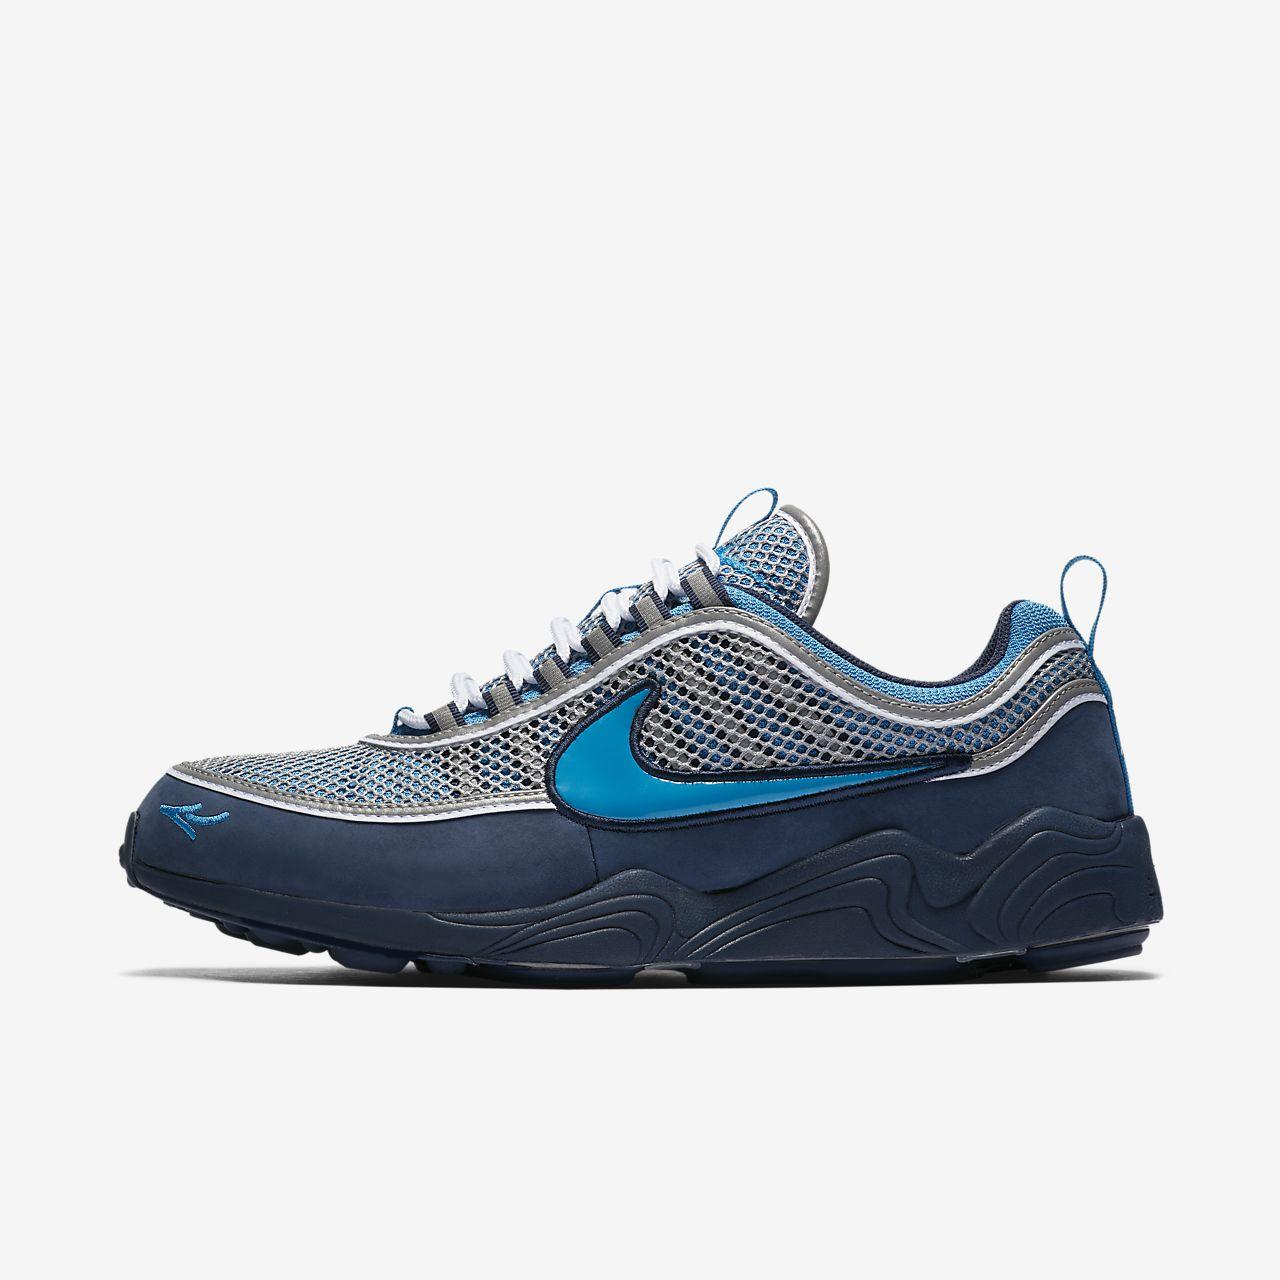 Nike Air Zoom Spiridon '16 / STASH 男子运动鞋